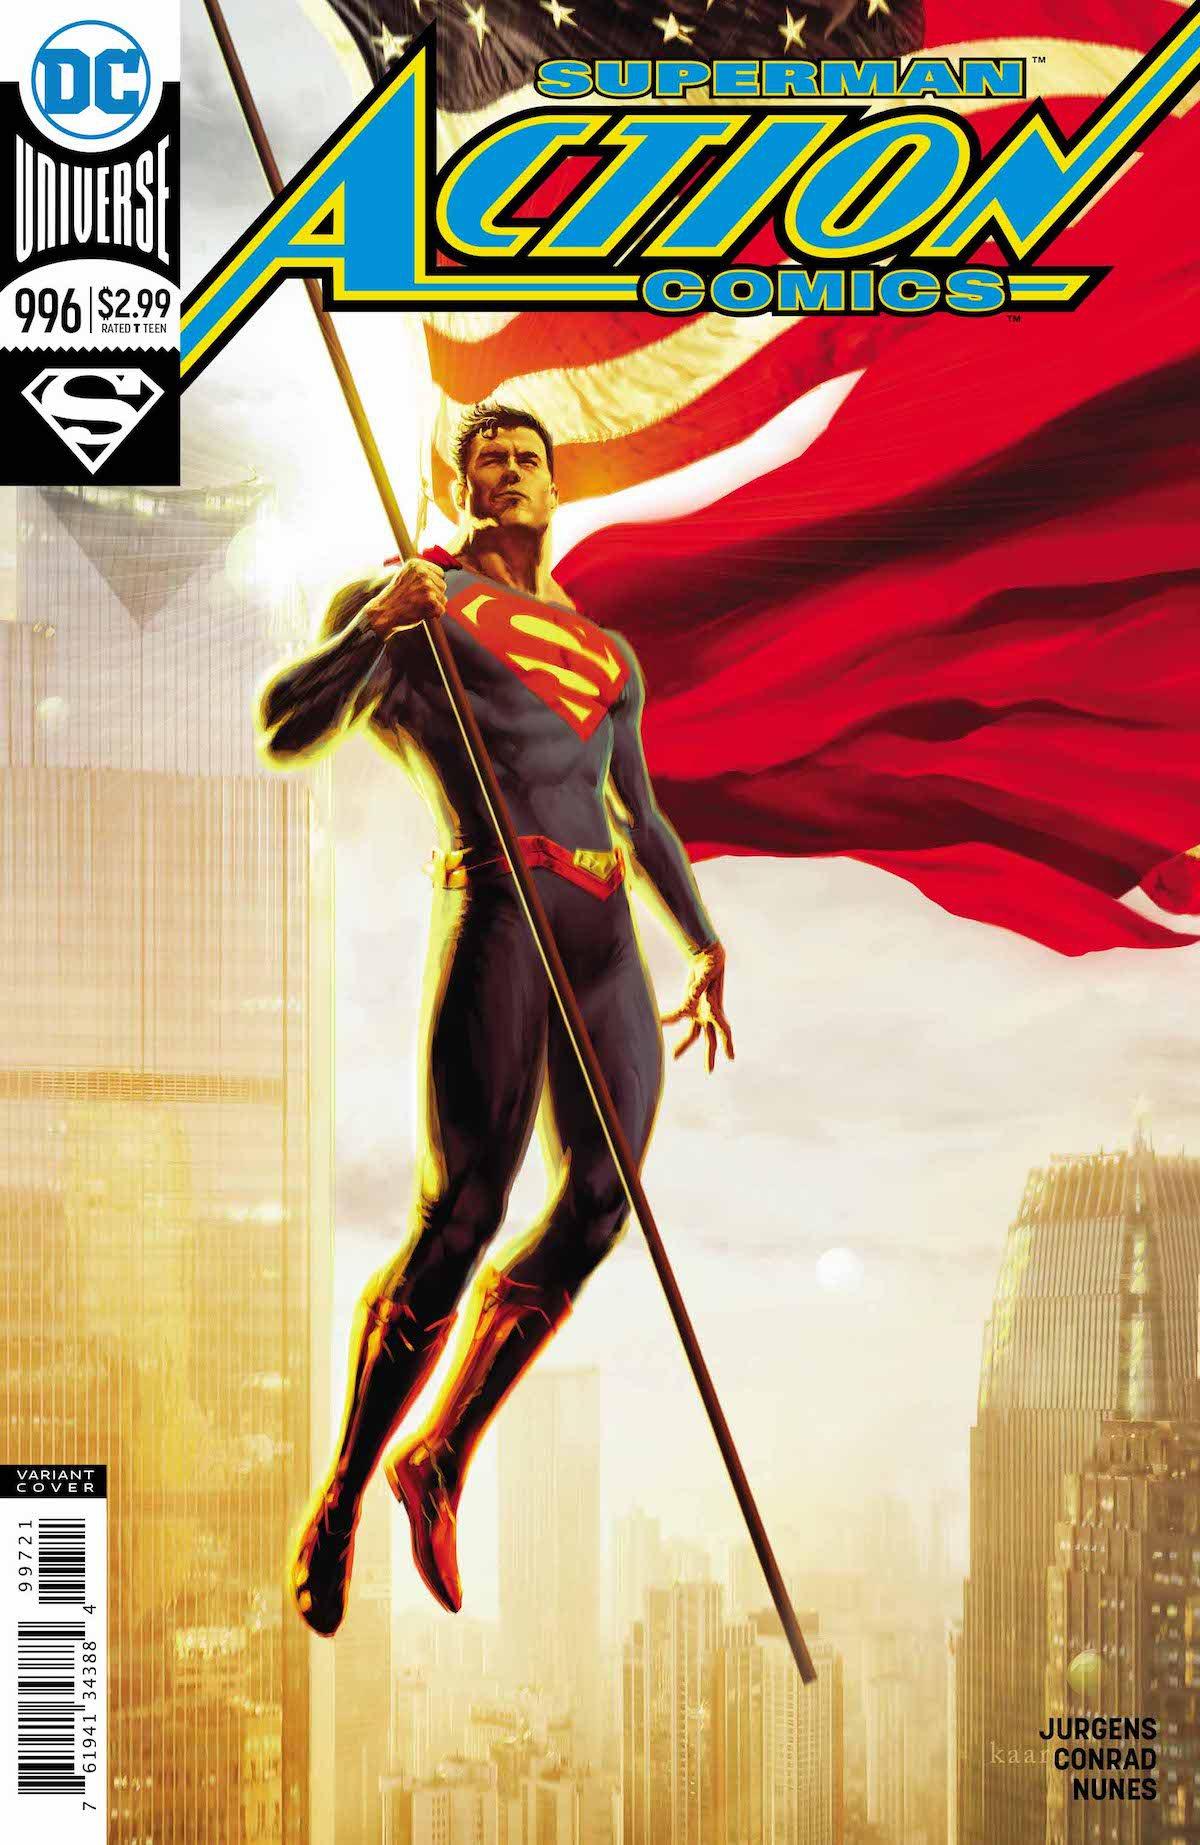 Superman: Action Comics #997 variant cover